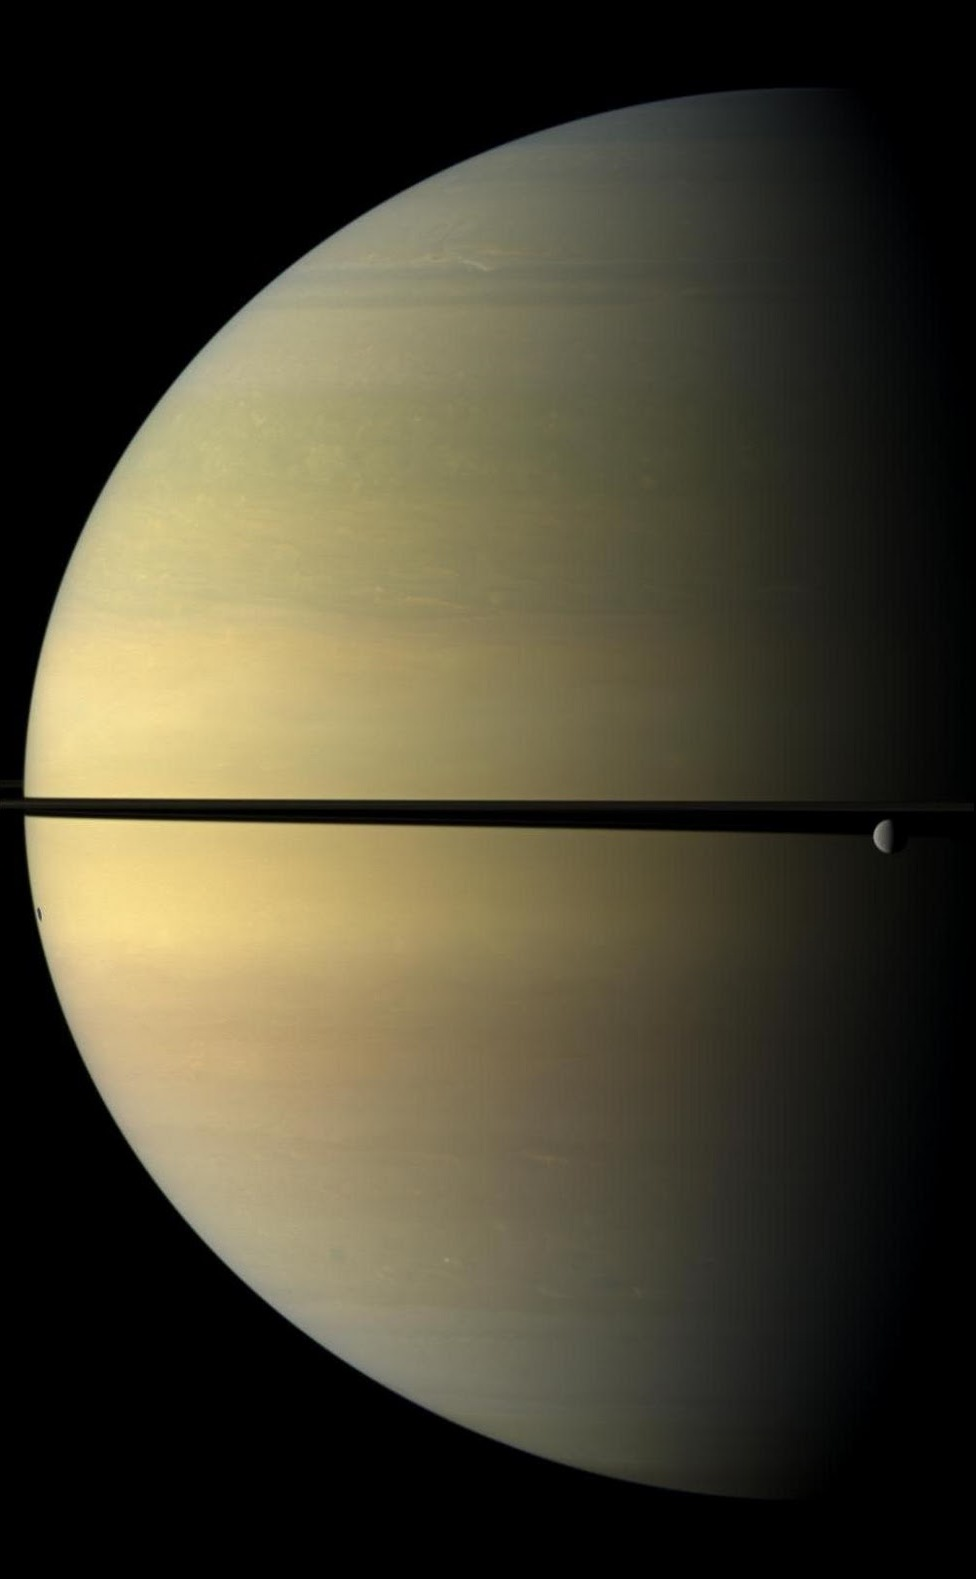 7) Сатурн и луна Реа.